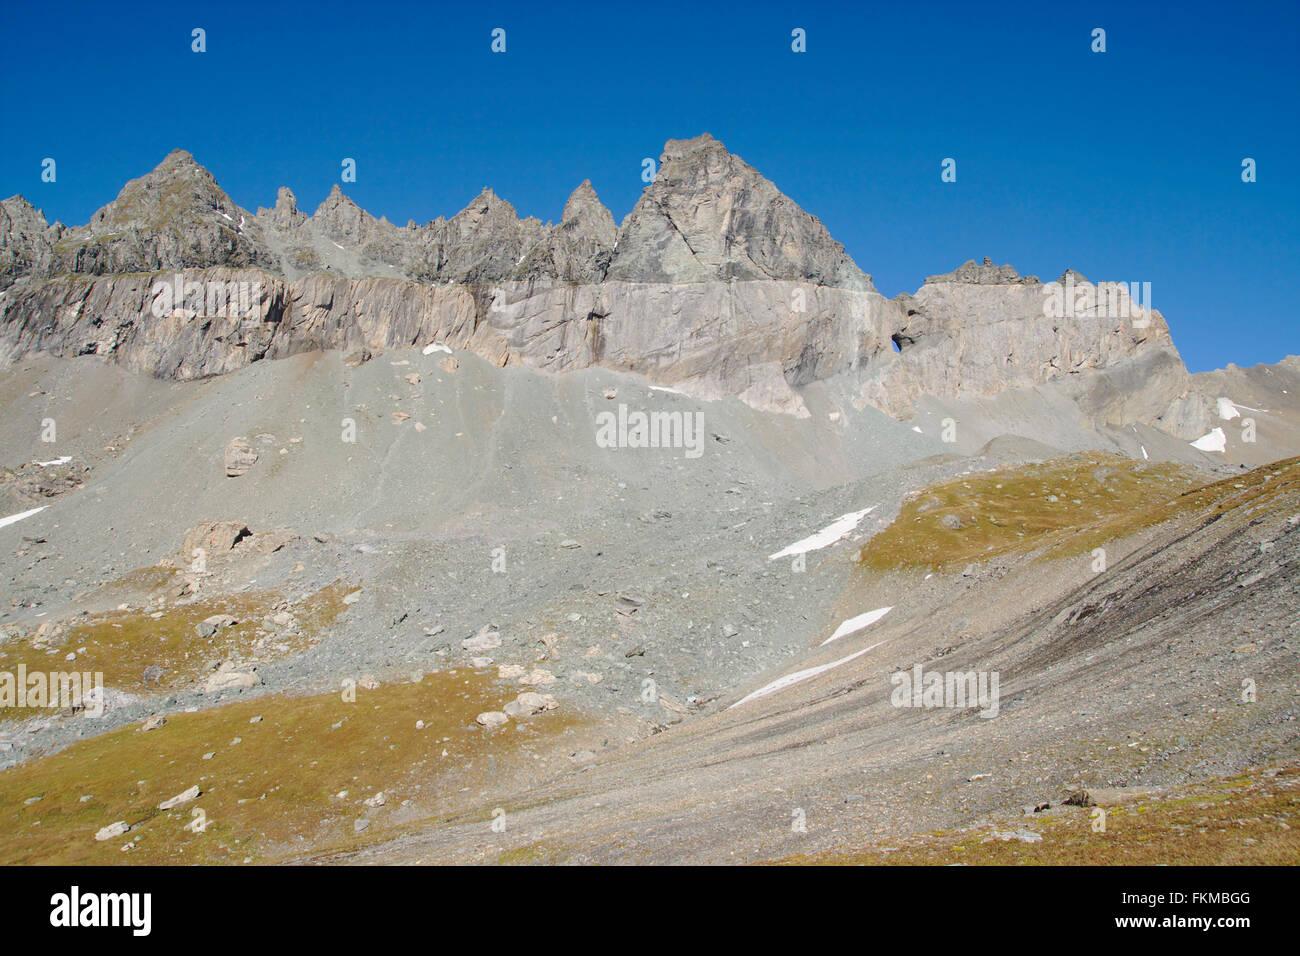 Glarus thrust, Tschingelhörner, Glarus Alps, Switzerland - Stock Image